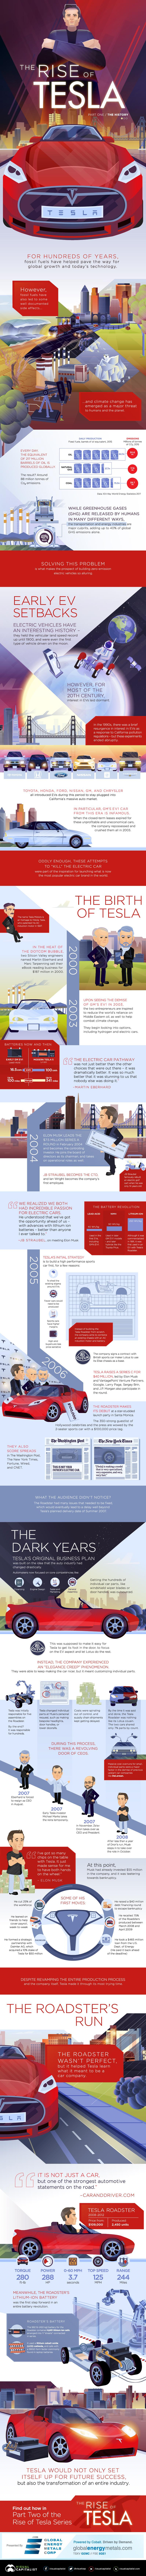 Tesla Part 1 -origin-story-tesla-infographic